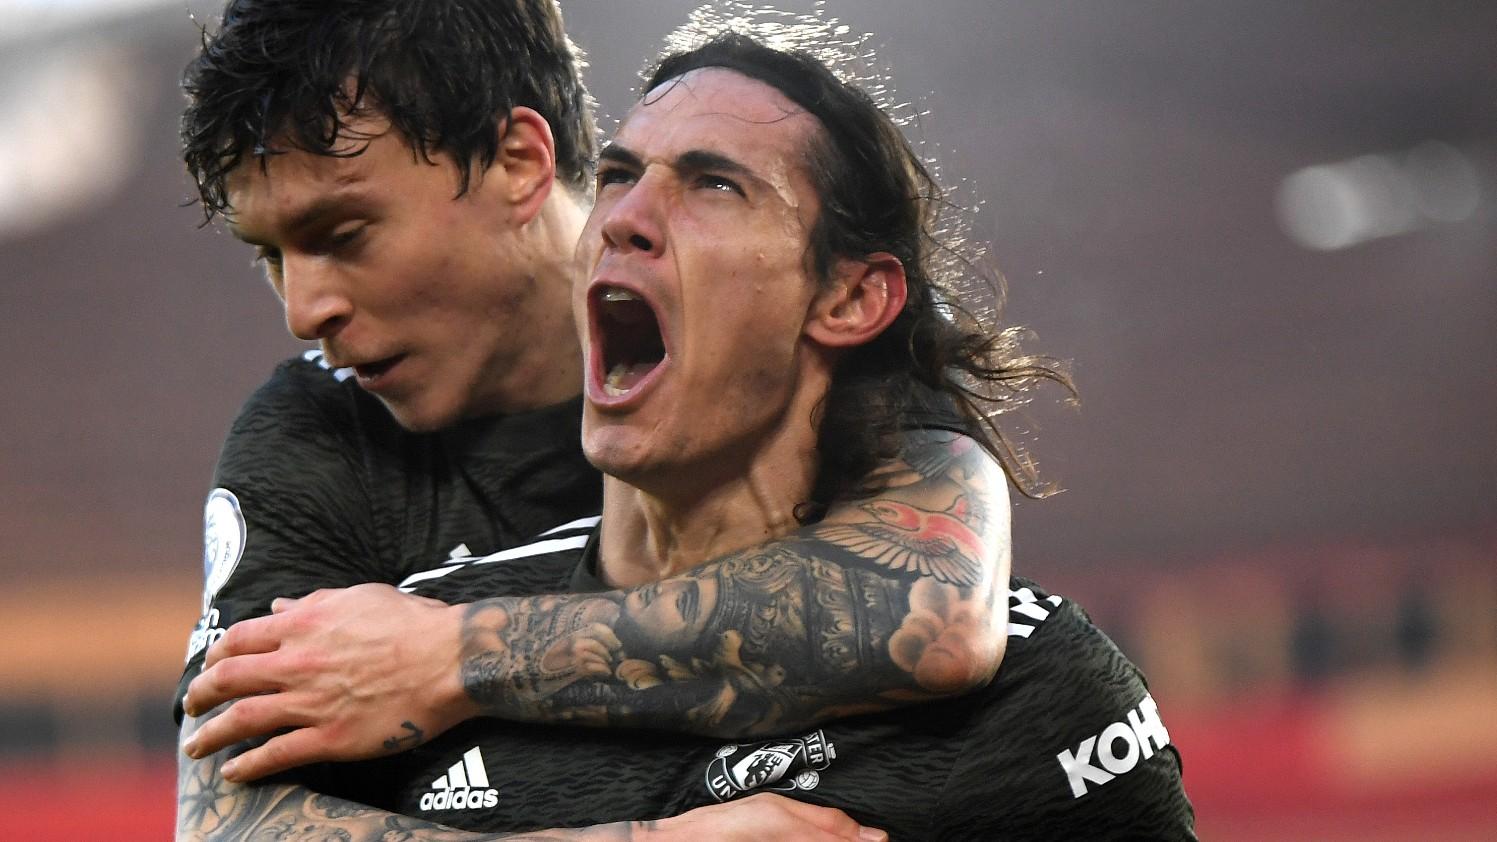 Uruguay striker Edinson Cavani celebrating a goal with Swedish defender Victor Lindelöf